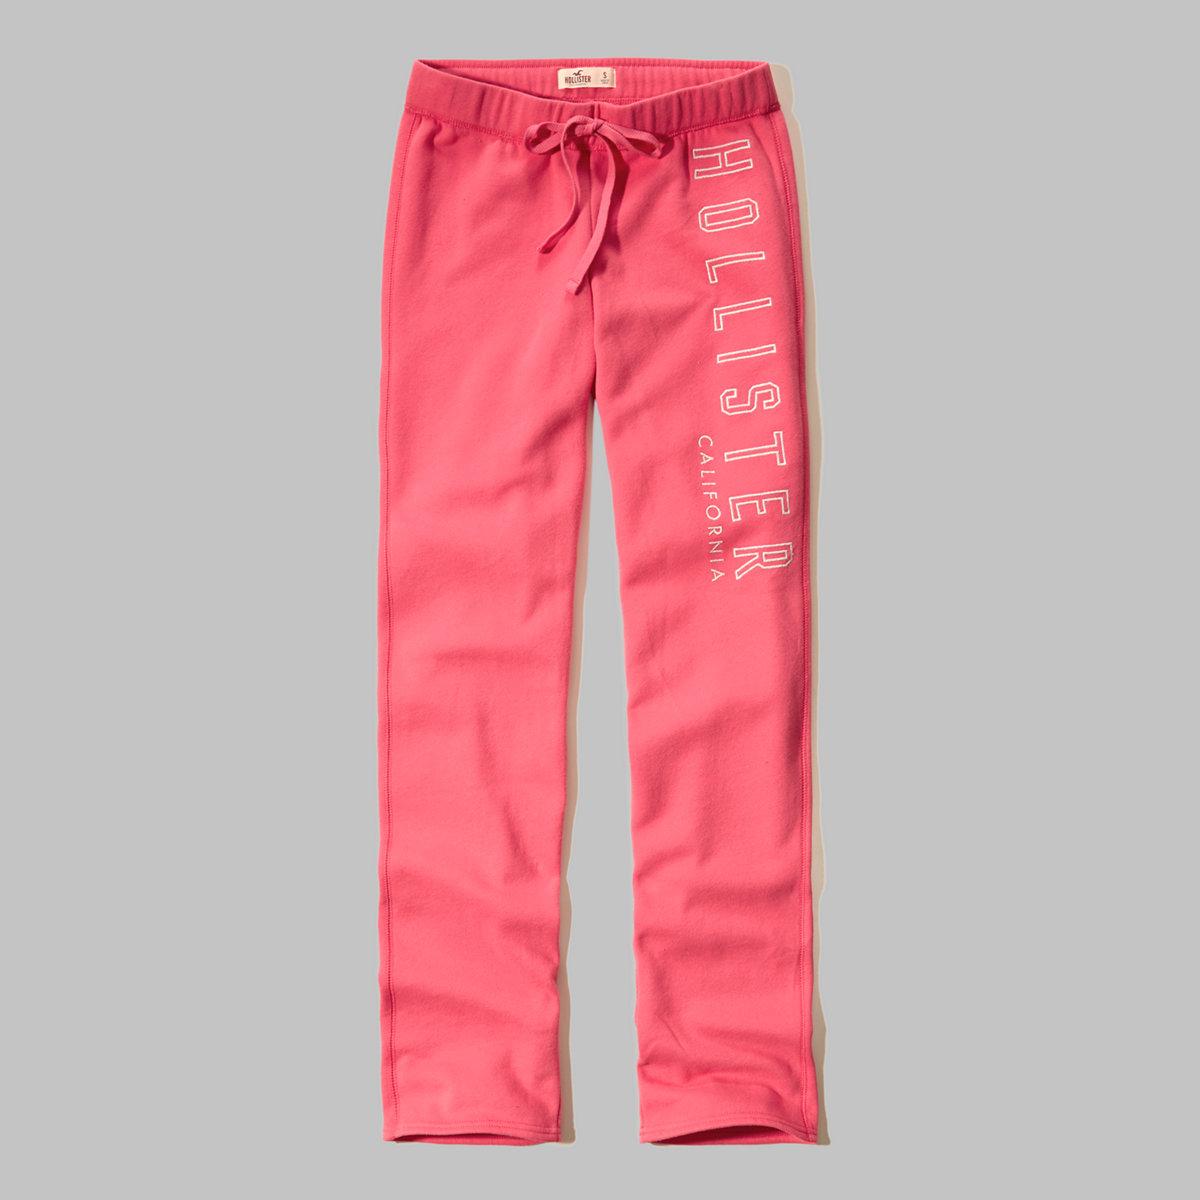 Hollister Classic Sweatpants